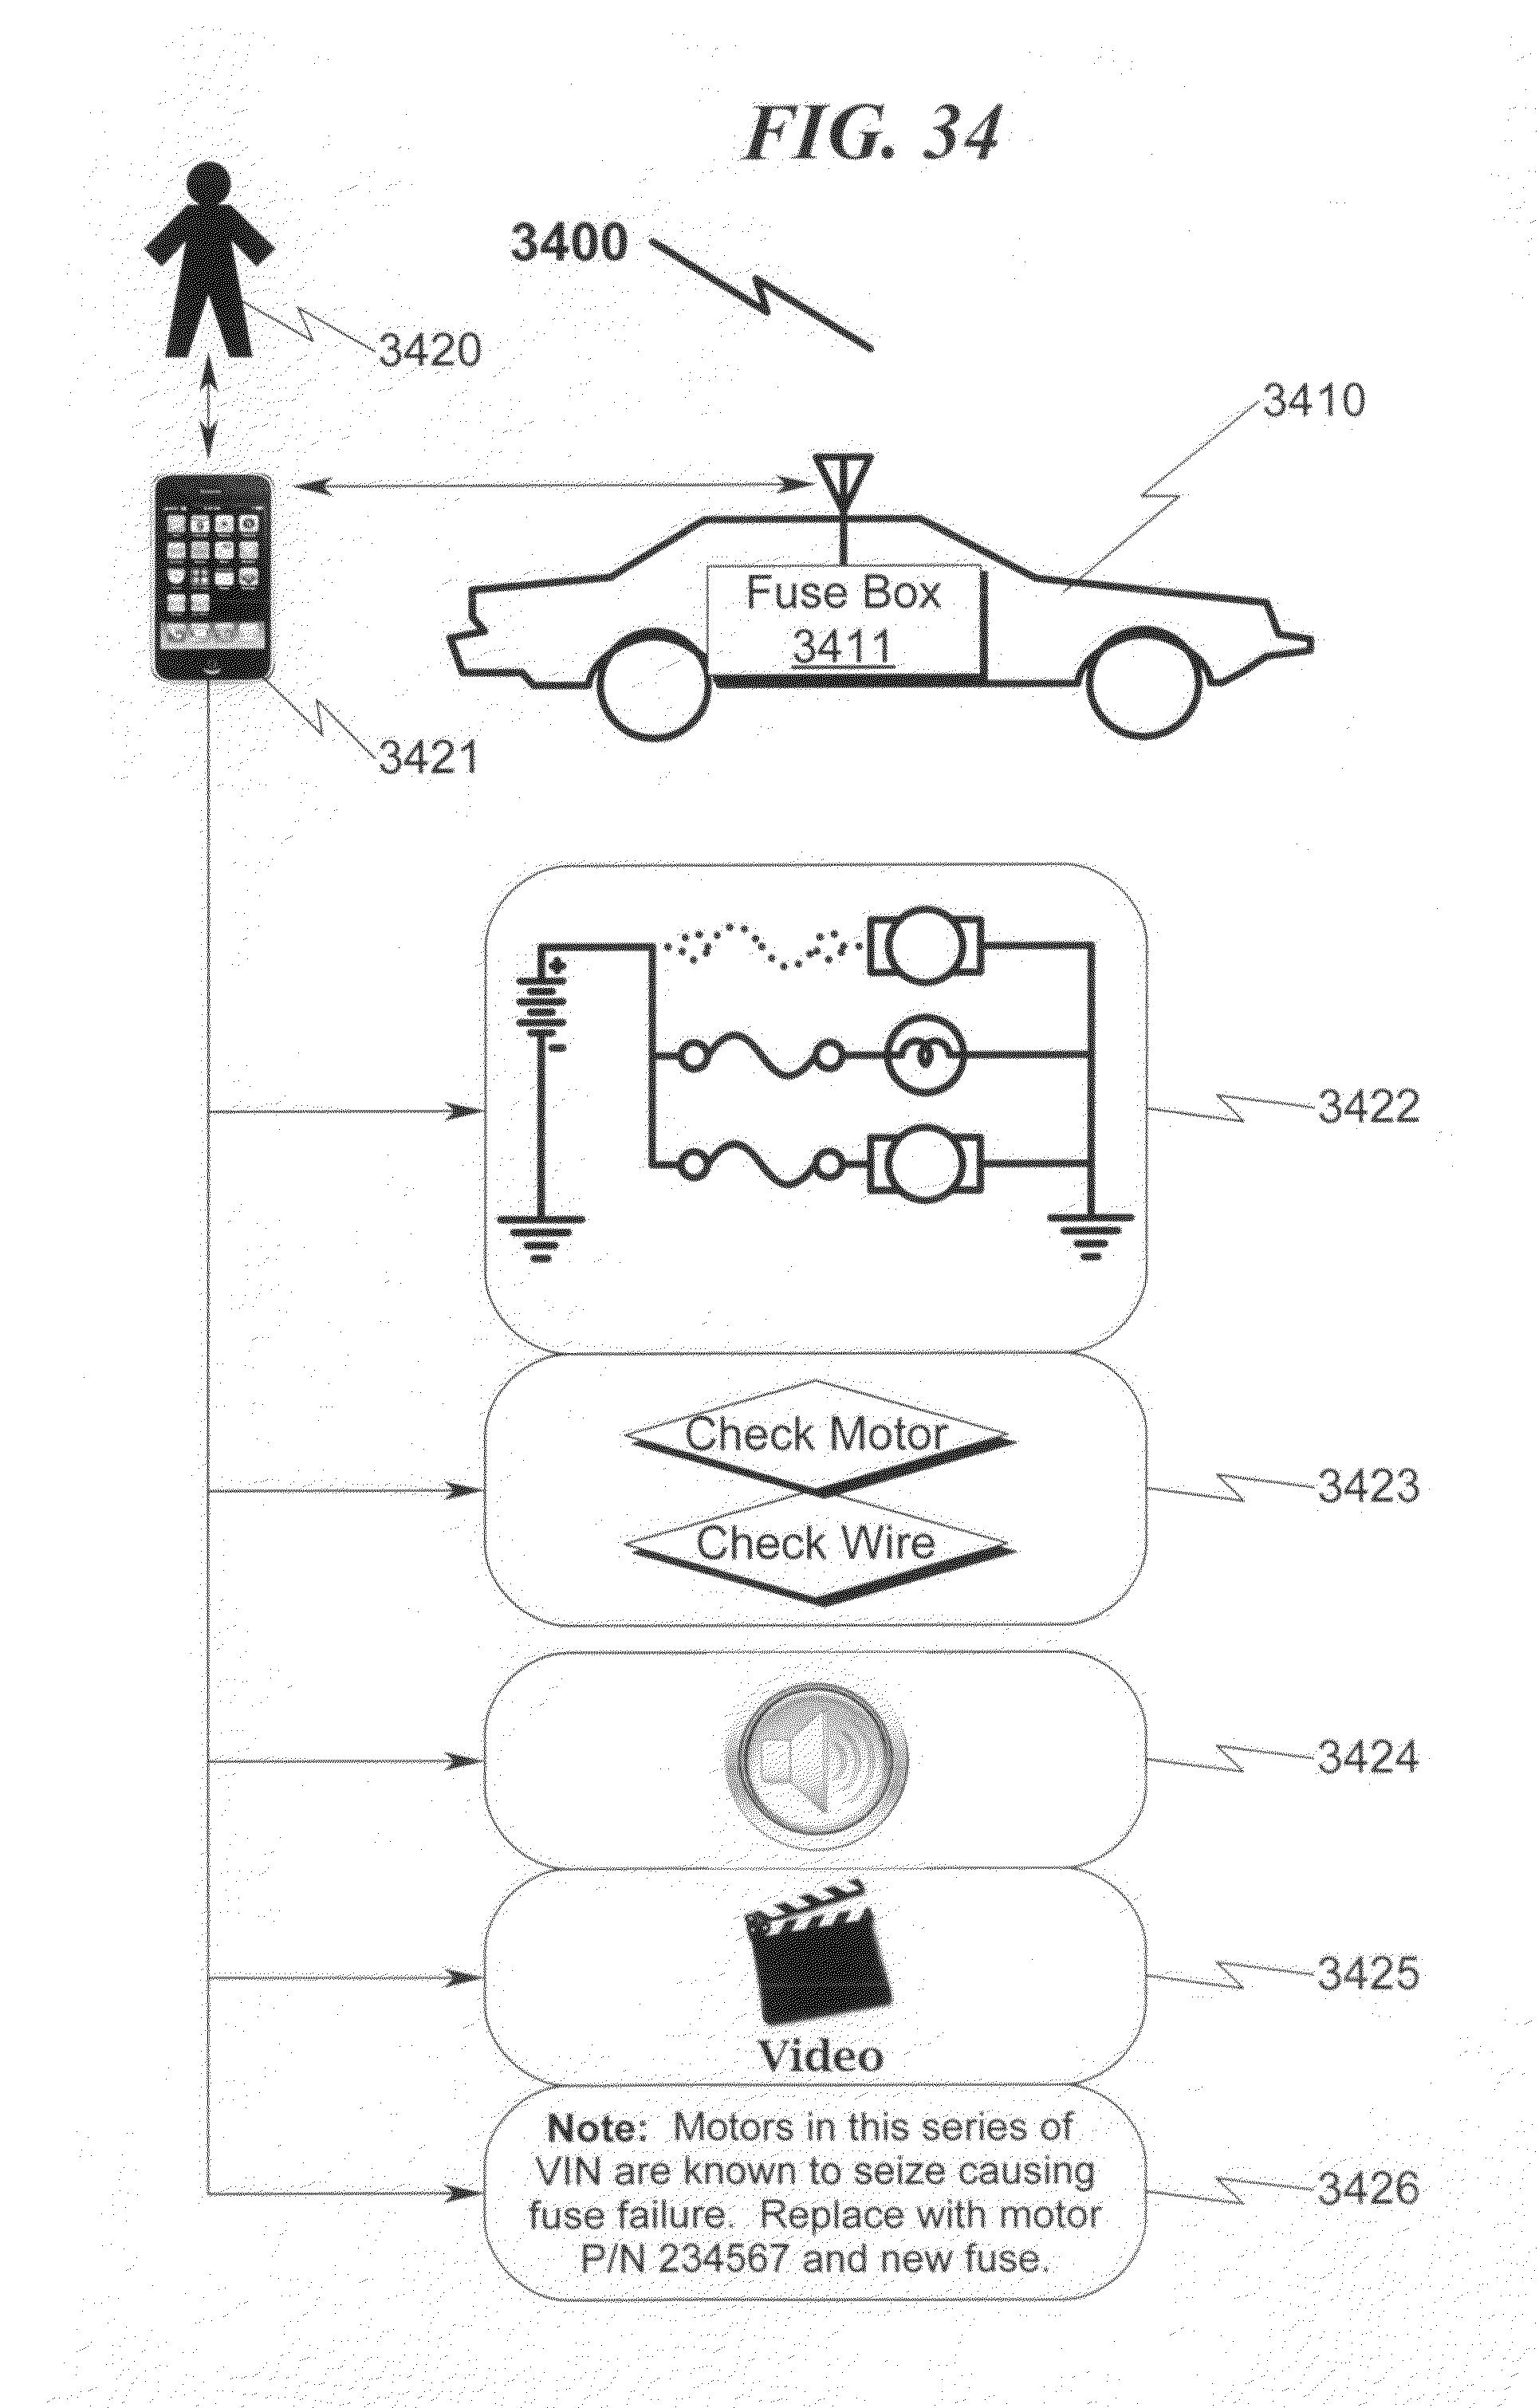 Doga Wiper Motor Wiring Diagram : Doga wiper motor wiring diagram front bumper assembly